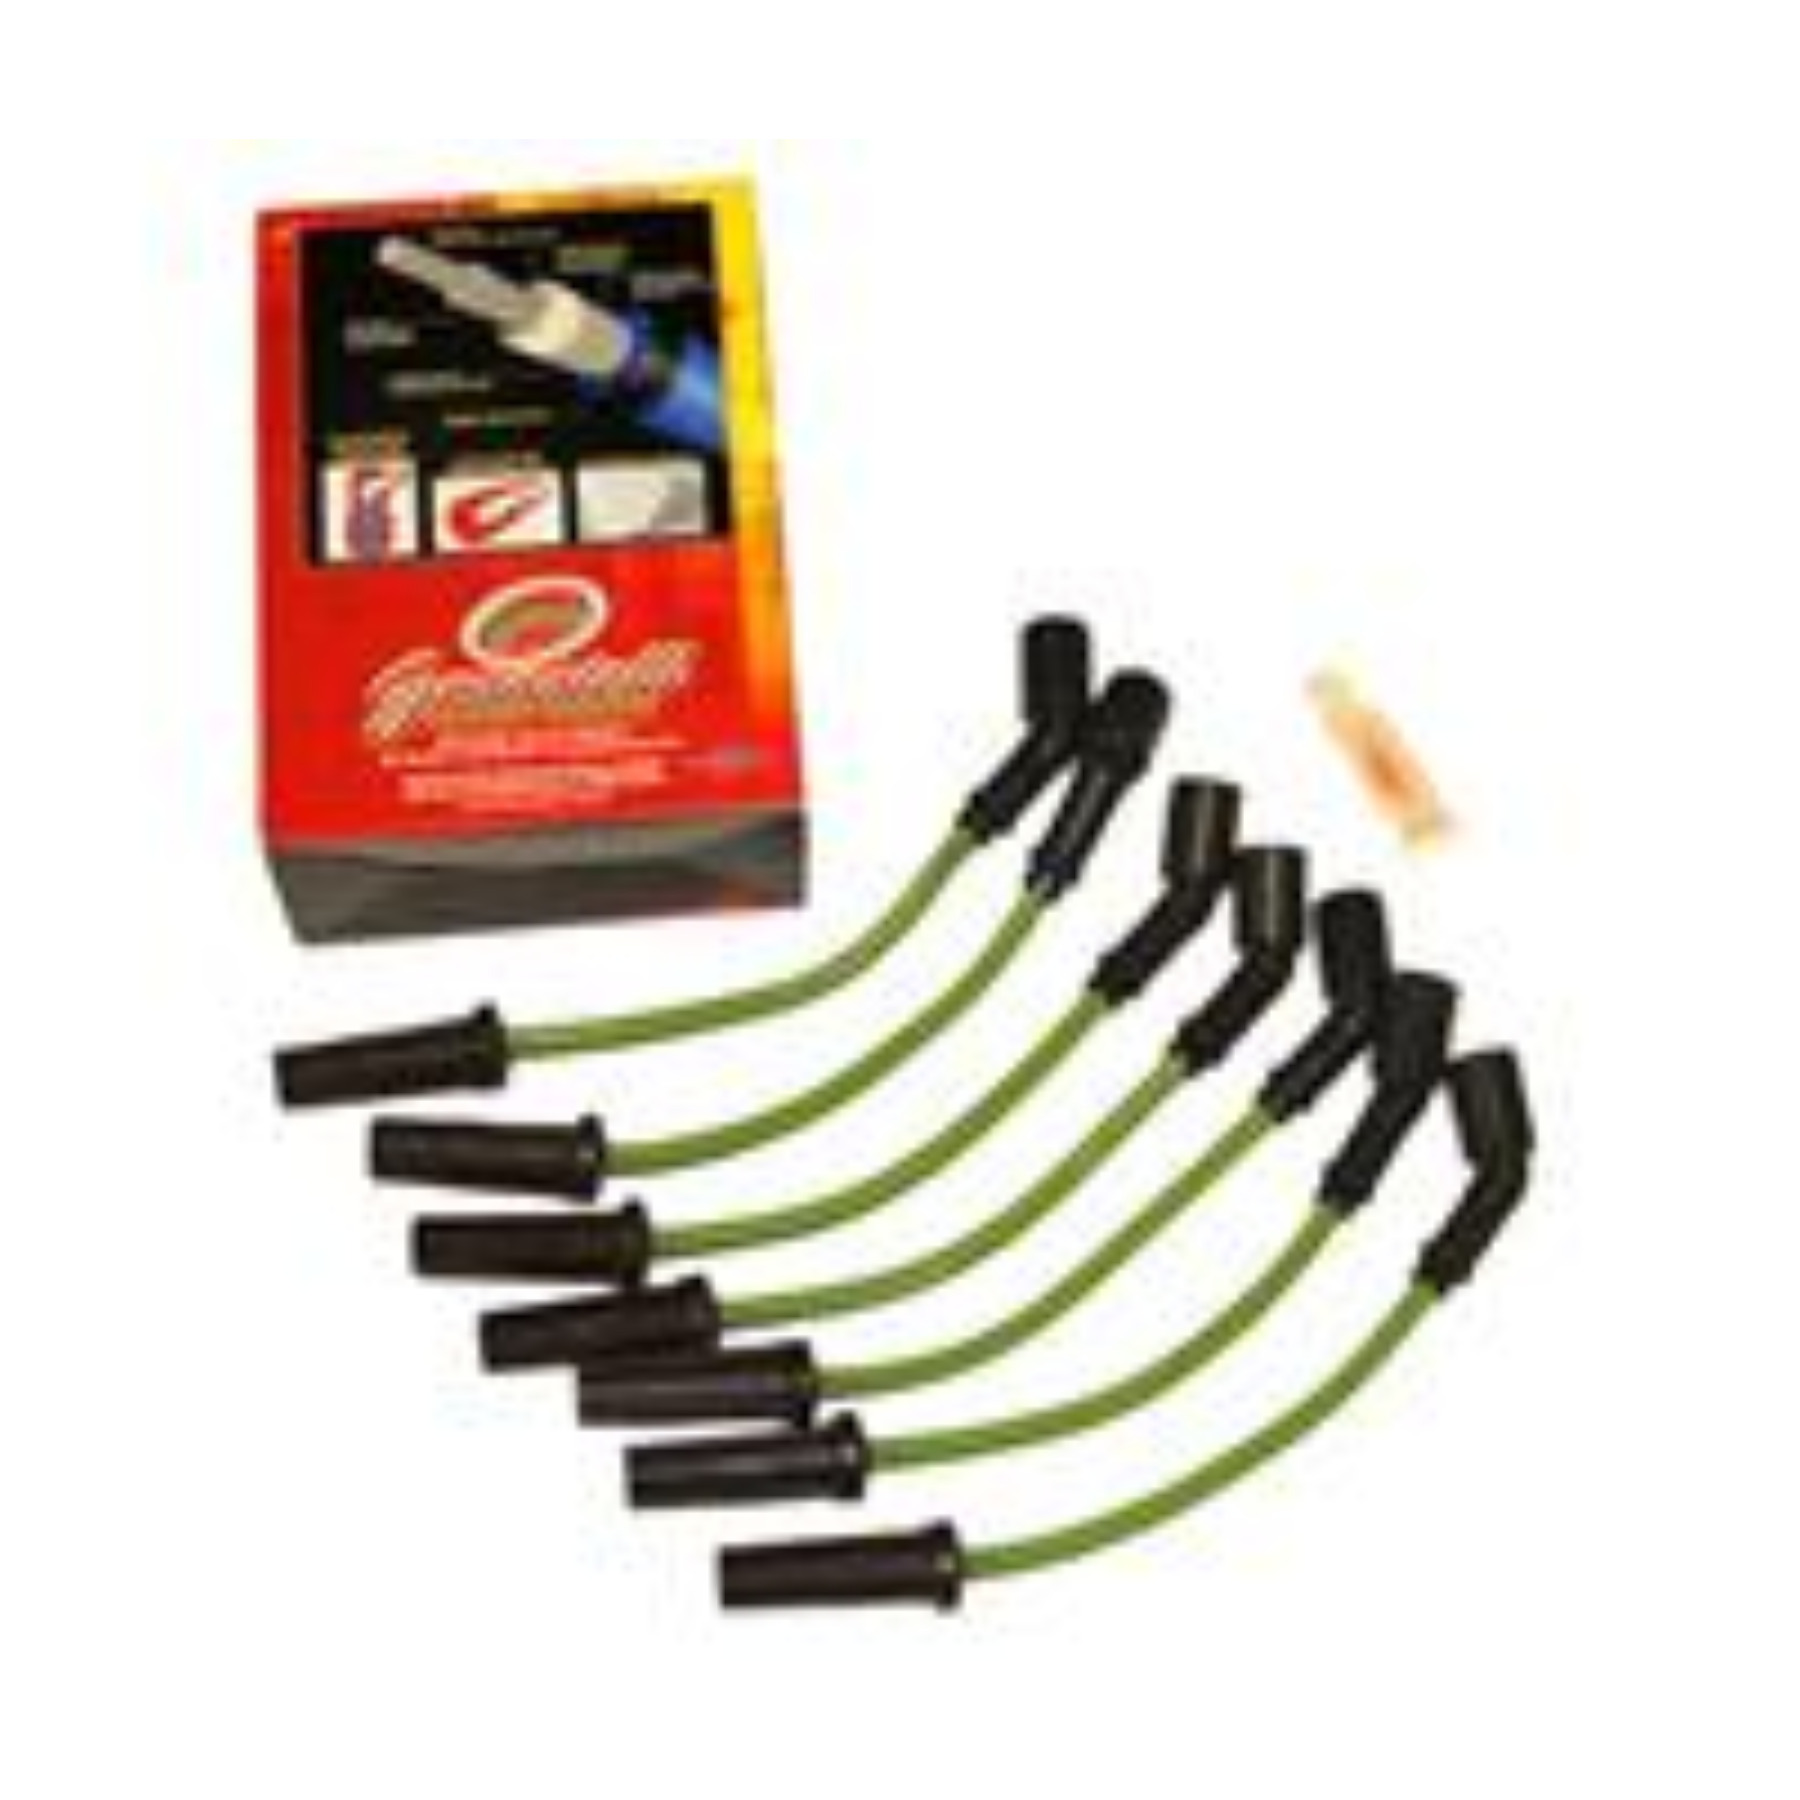 MPG Plus Spark Plug Wires